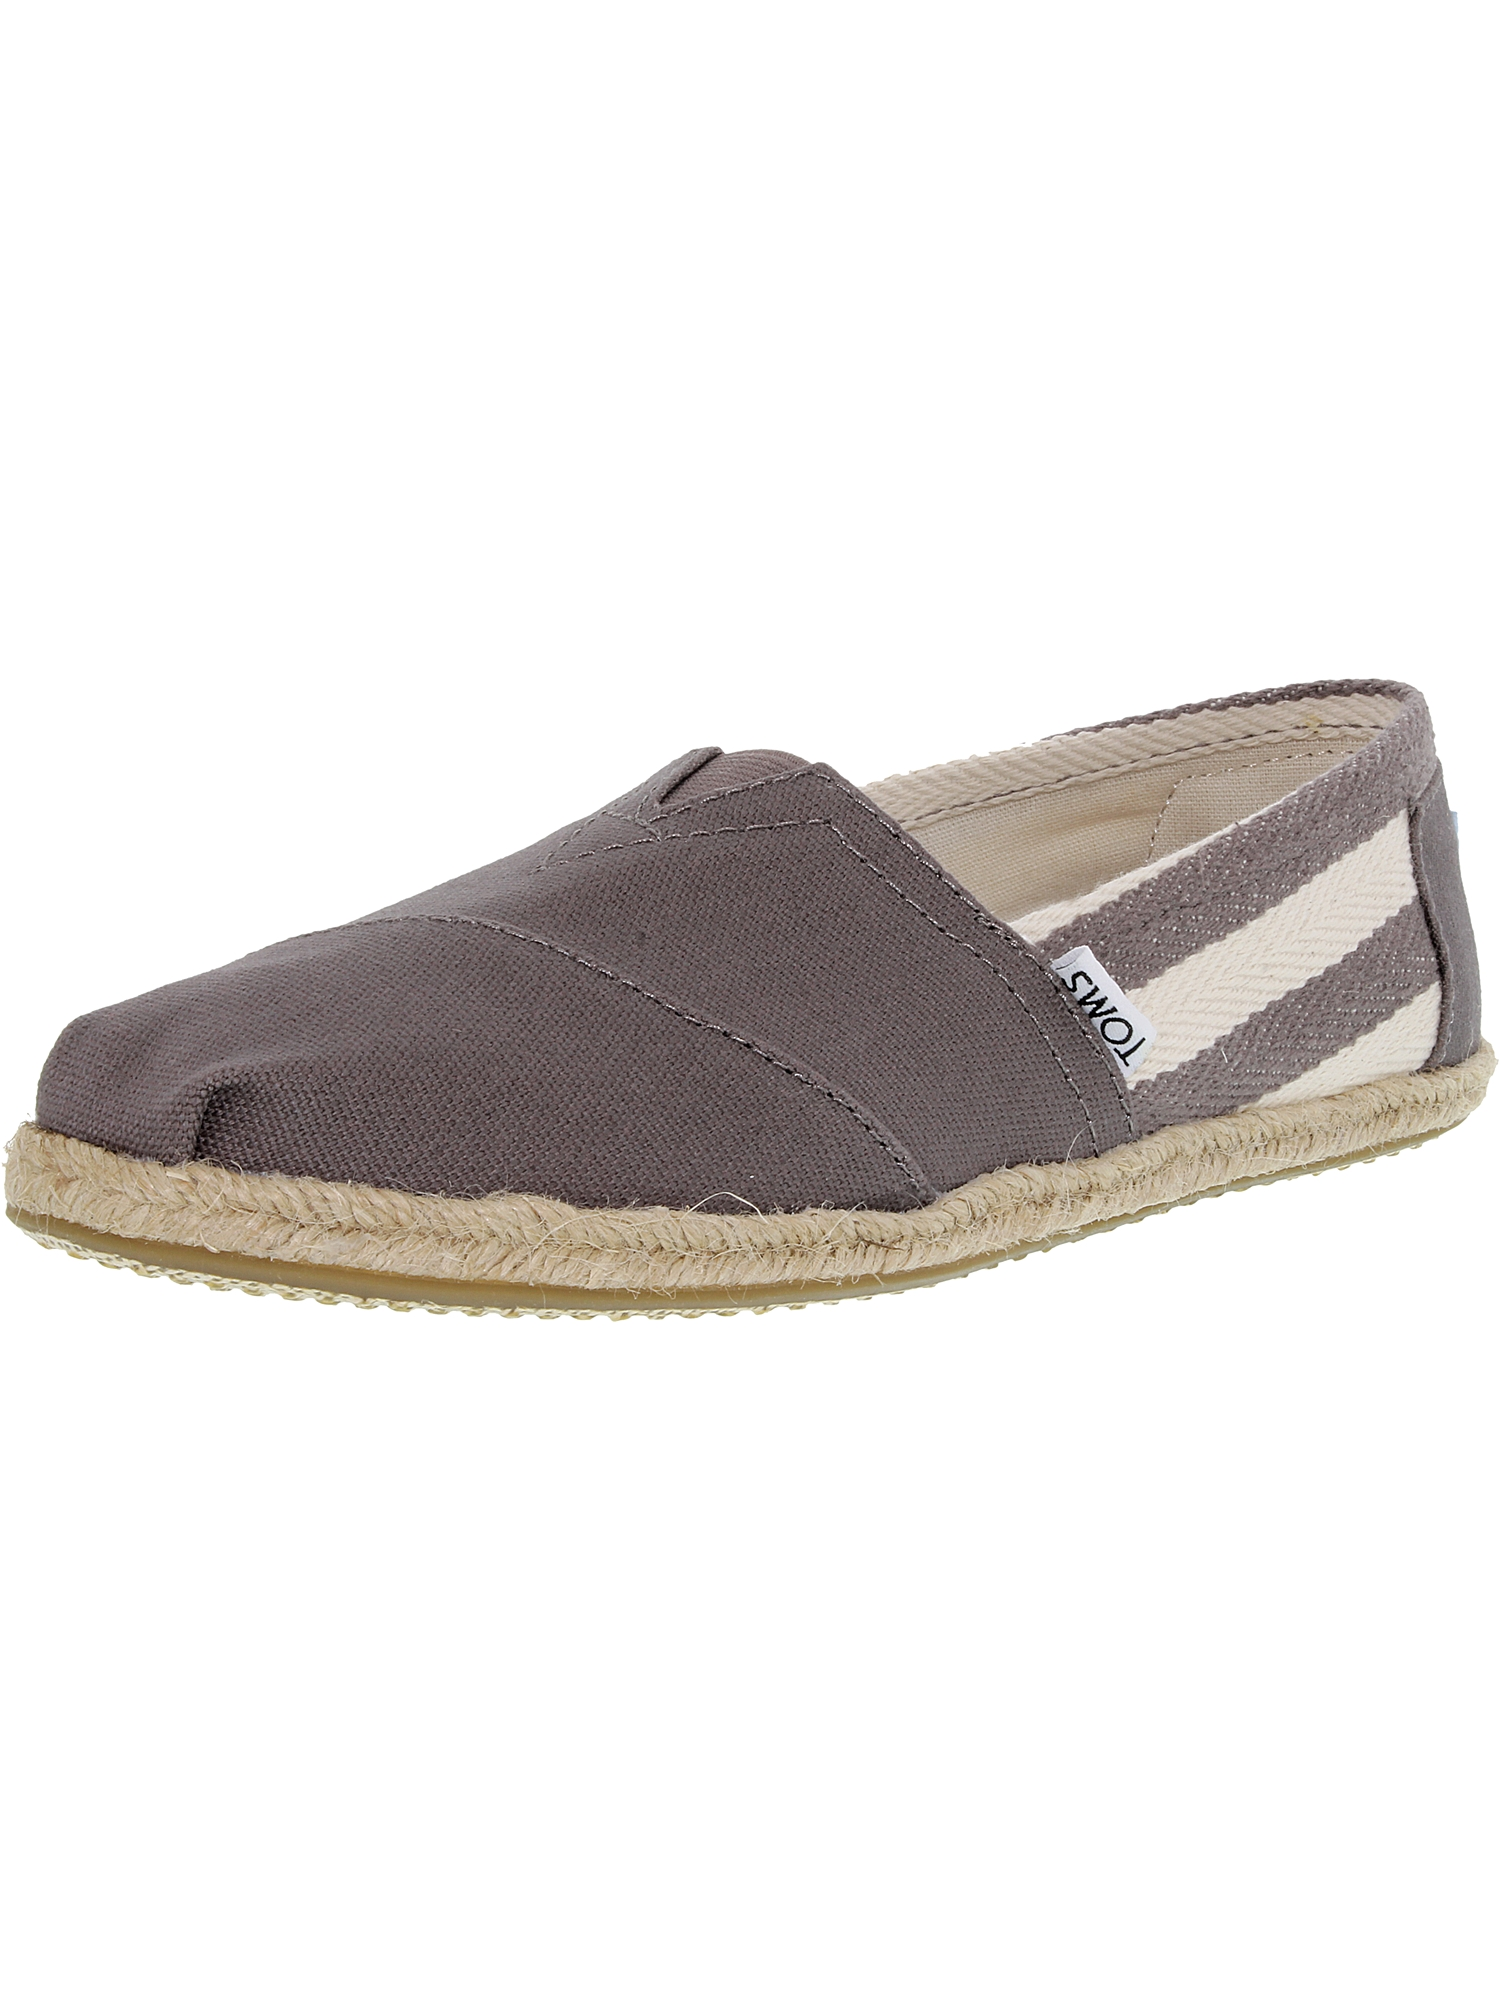 Toms Women's Classic Striped Canvas Dark Grey Stripe University Ankle-High Flat Shoe - 10M